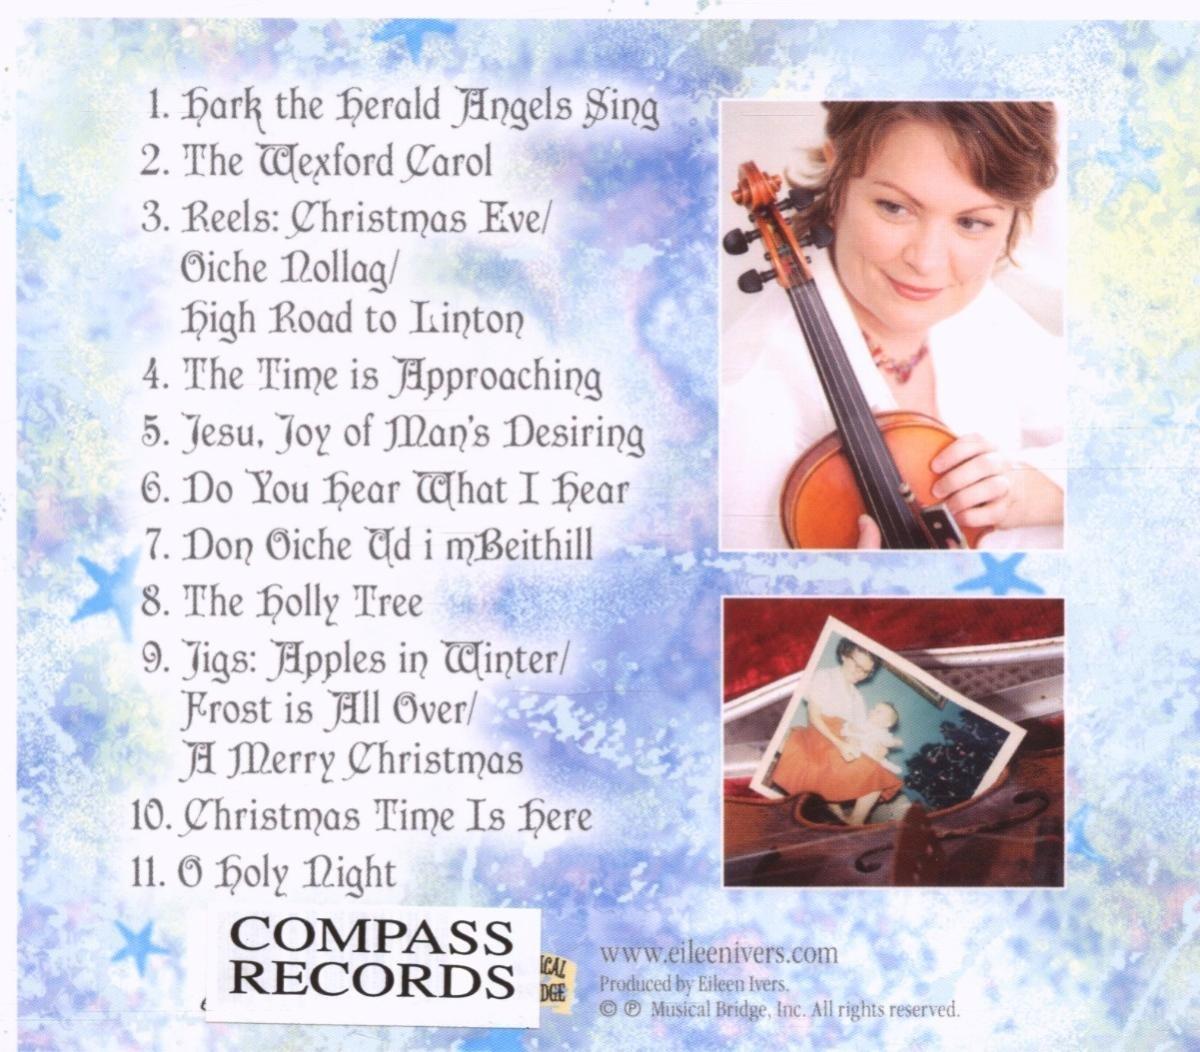 Eileen Ivers - An Nollaig: An Irish Christmas - Amazon.com Music